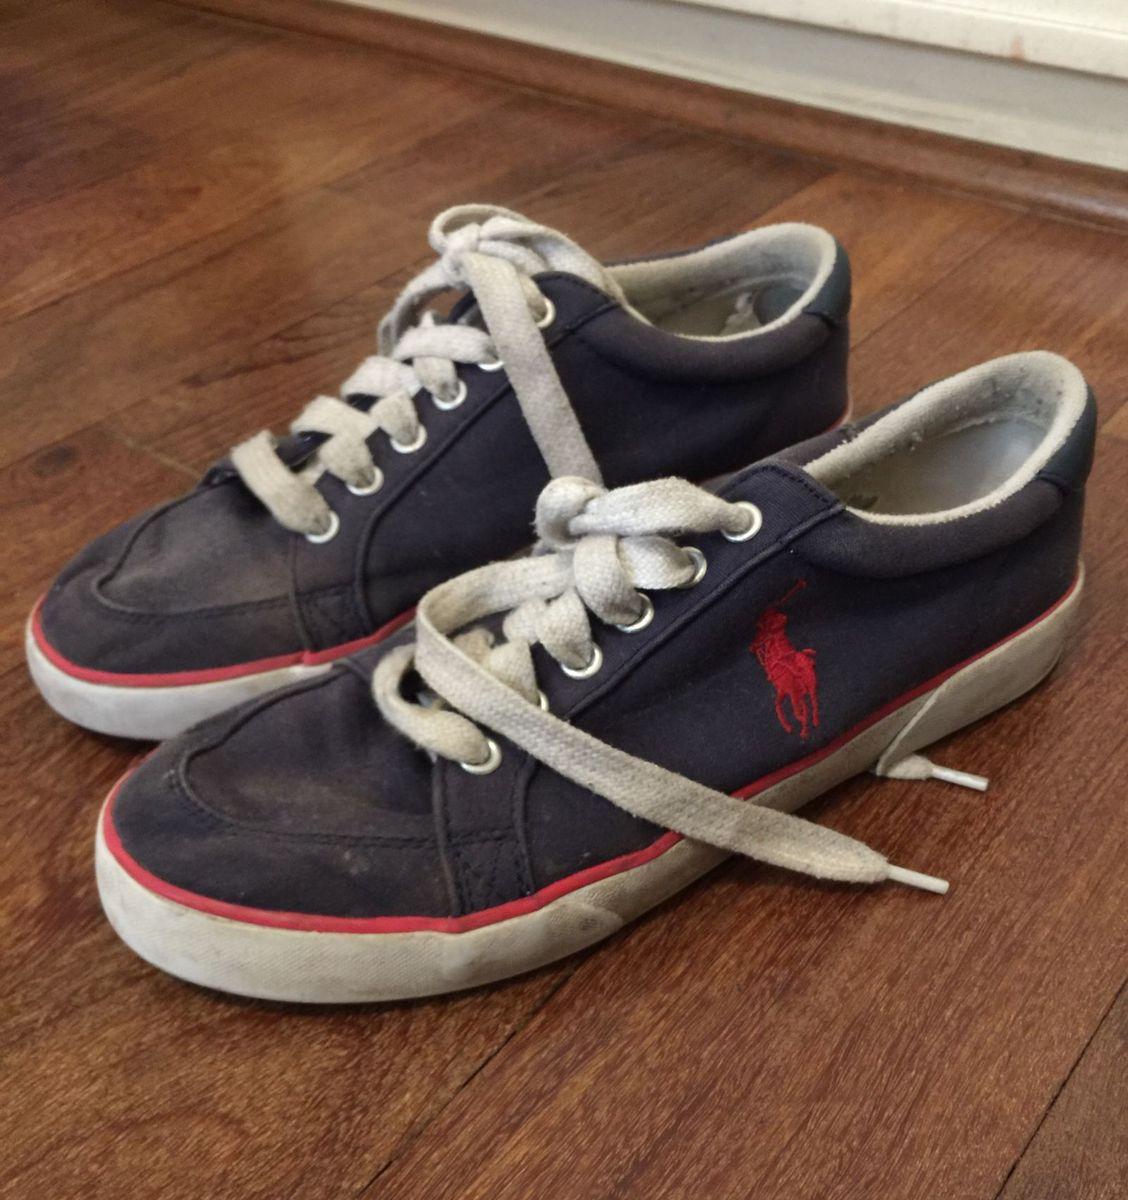 dae1ac0ada25f Tenis Polo Ralph Lauren | Sapato Masculino Polo Ralph Lauren Usado ...